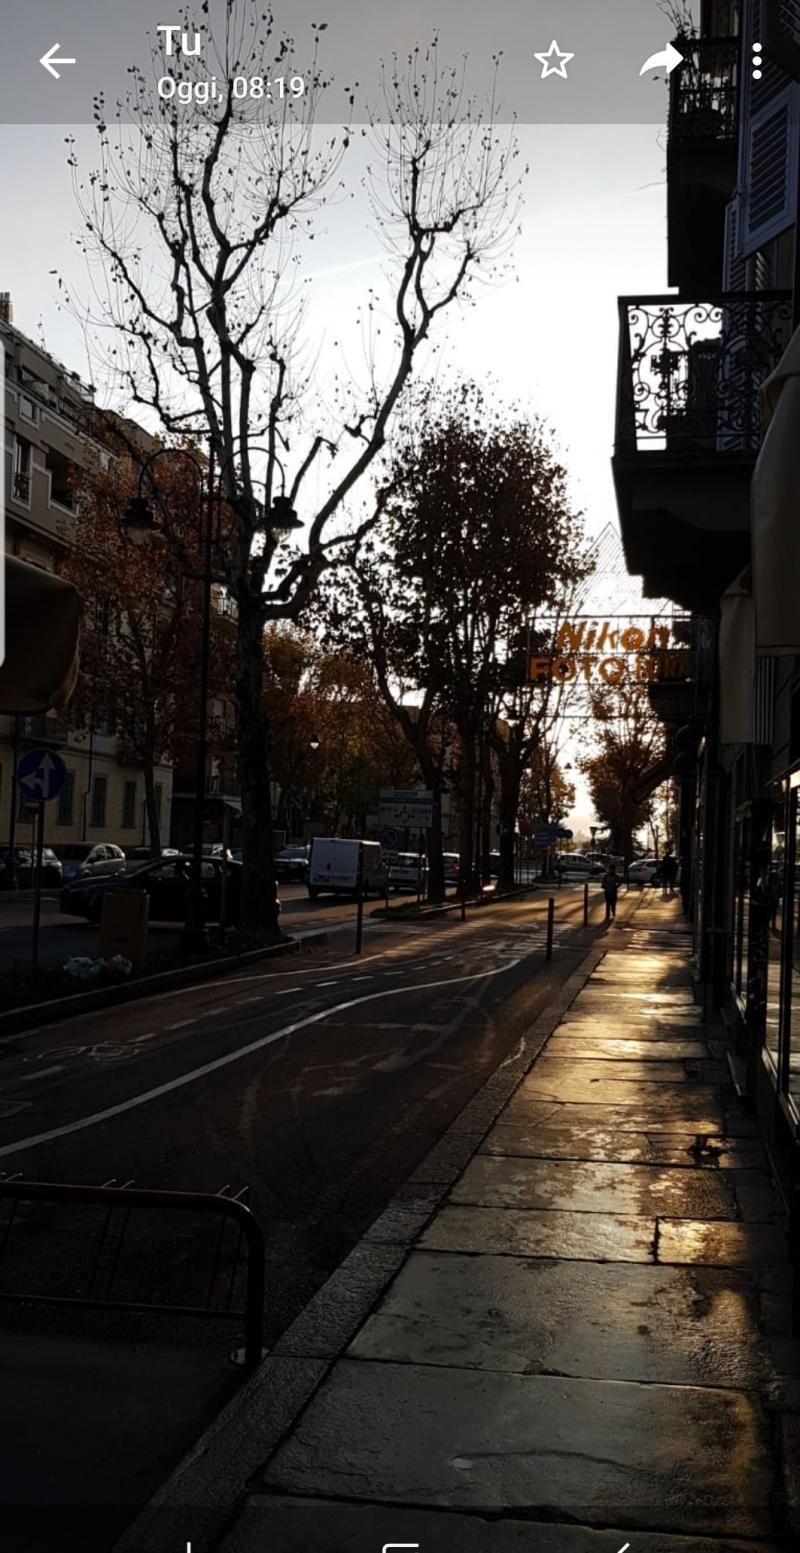 Cuneo 15 novembre 2018